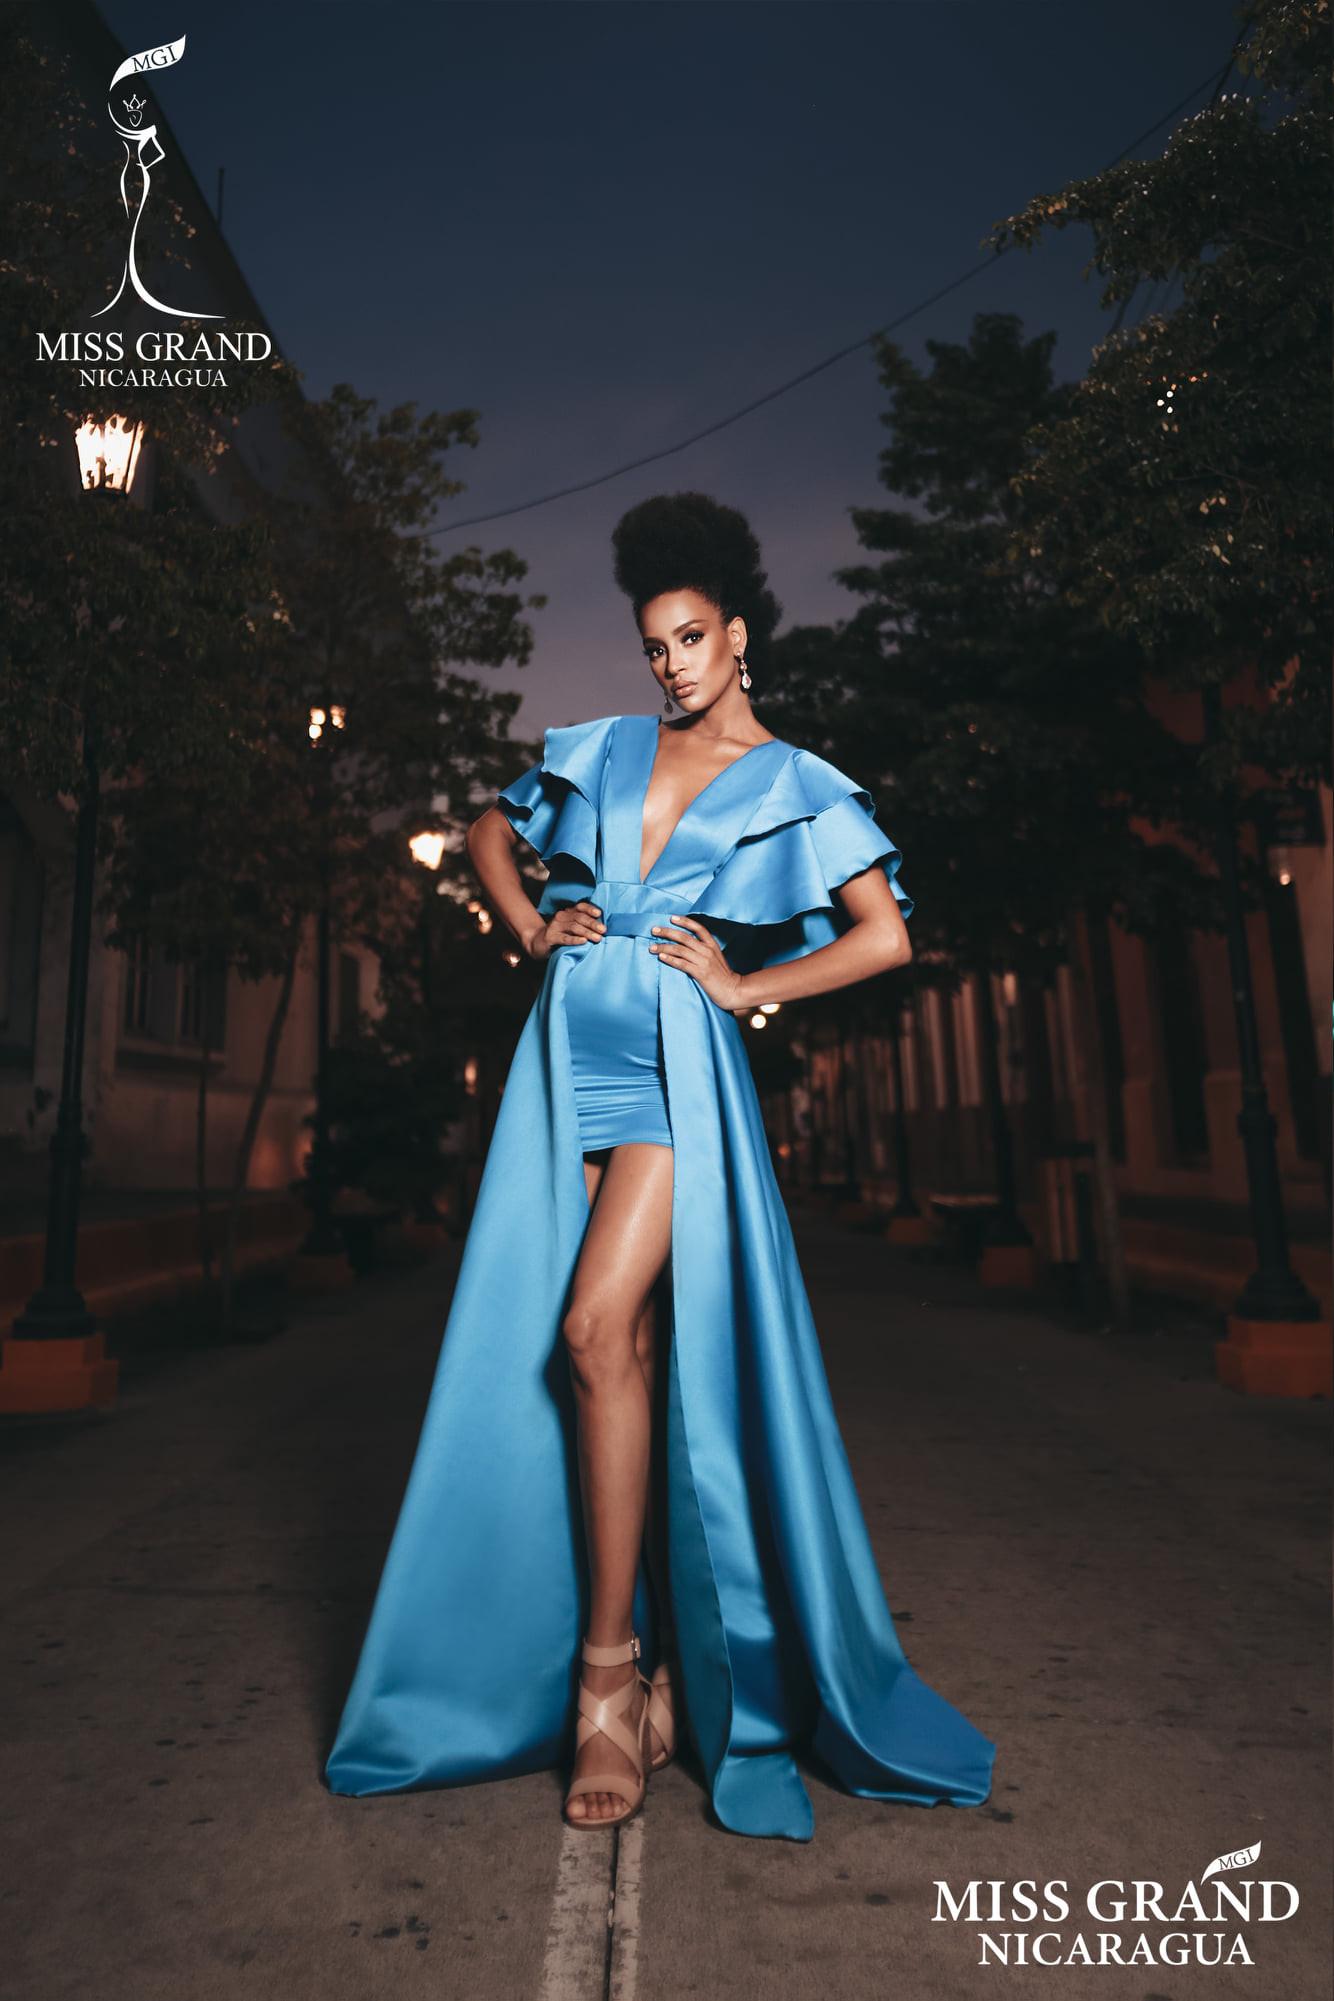 candidatas a miss grand nicaragua 2021. final: 31 july. - Página 2 O5TNe9